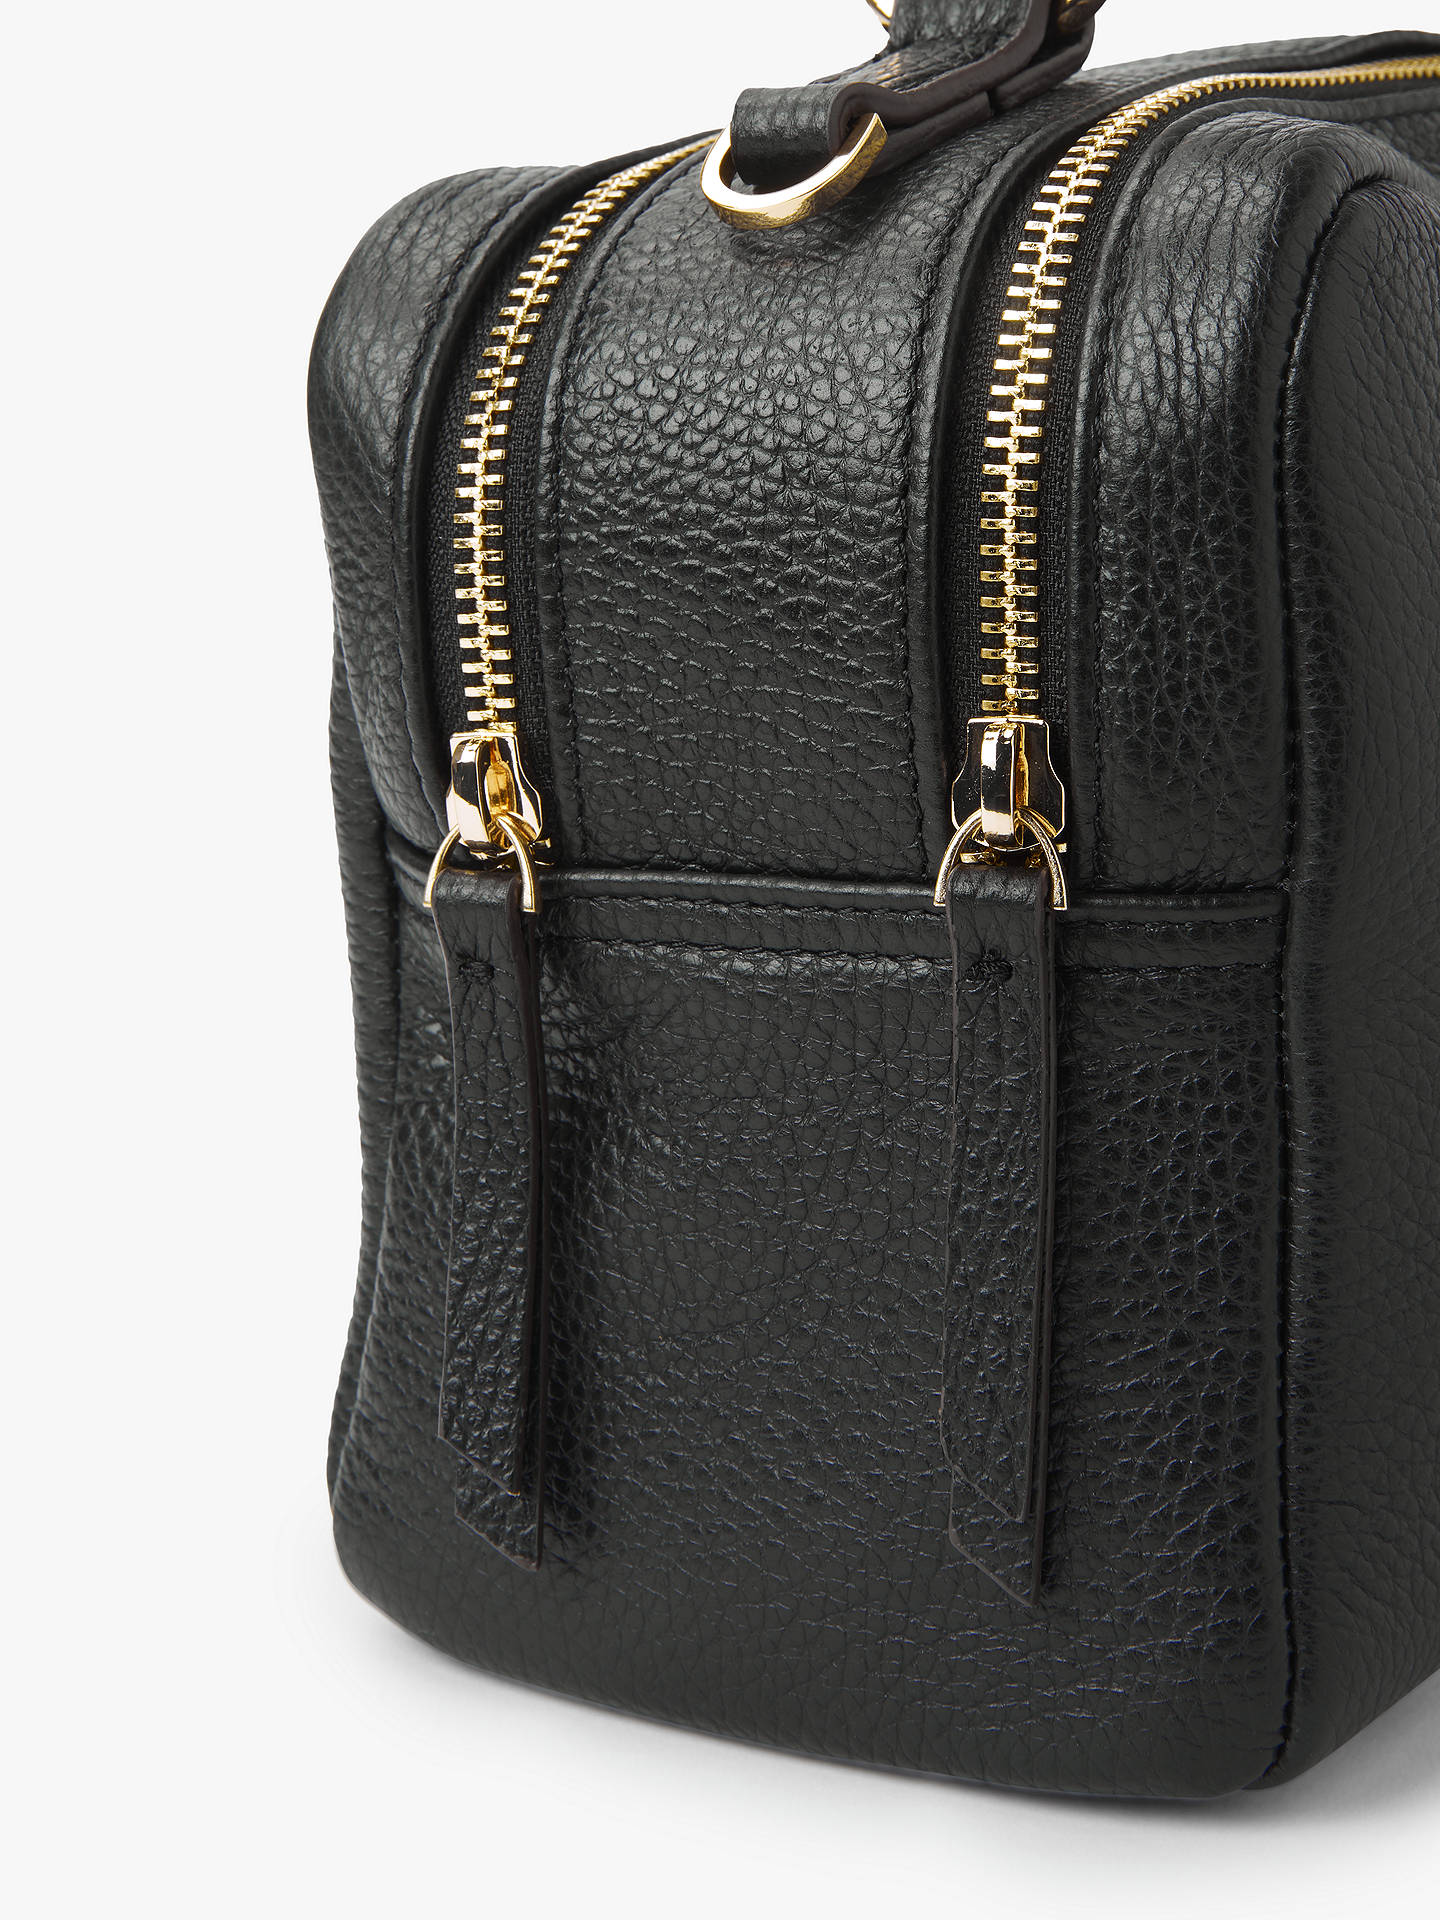 92b355219b Neuville Leather Top Handle Satchel Bag, Black Grain